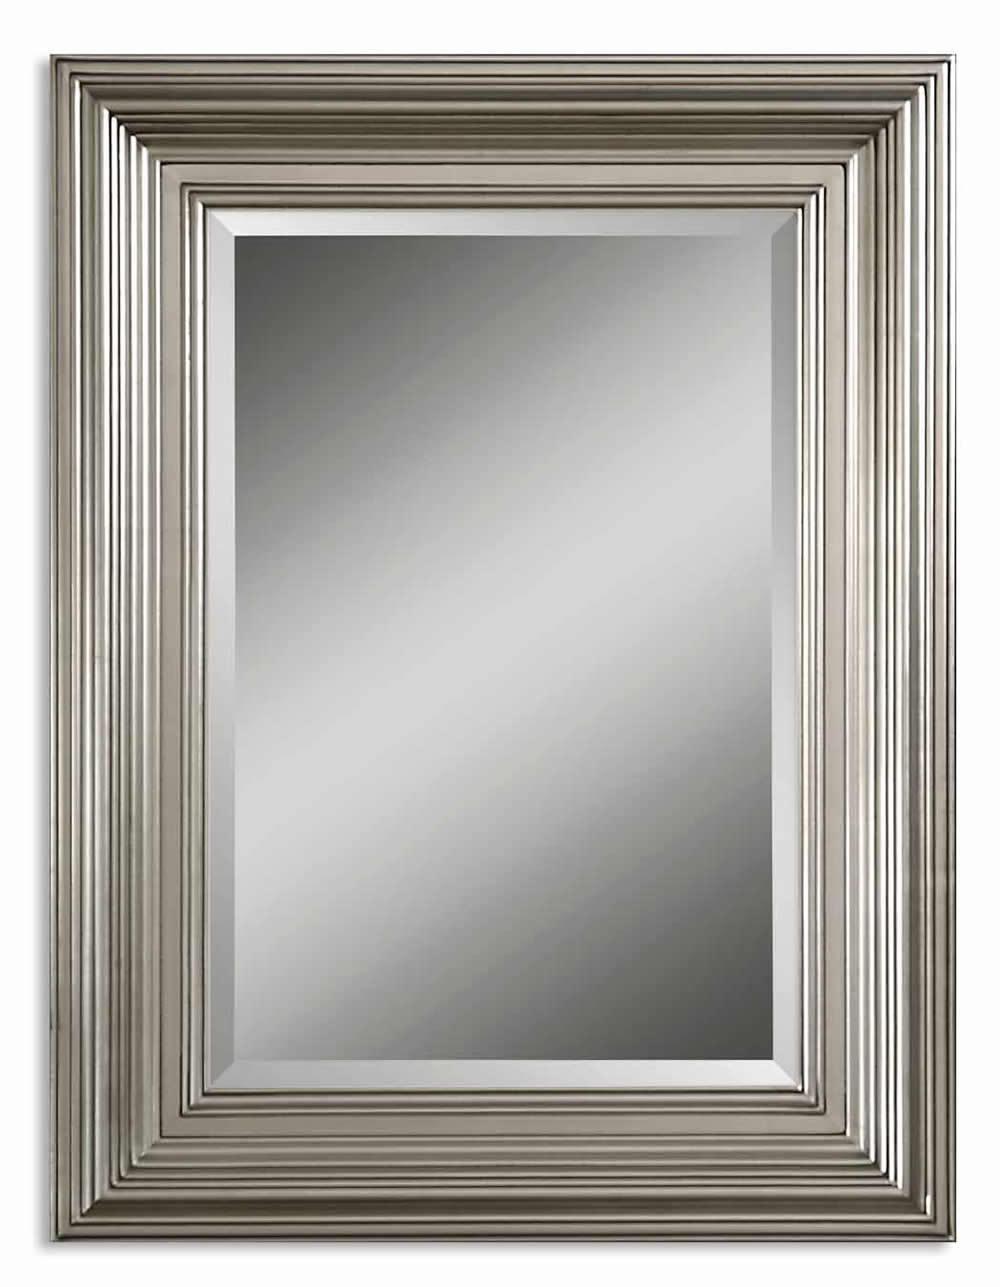 Uttermost 14133 B Mario Mirror Silver Frame 30x40   eBay